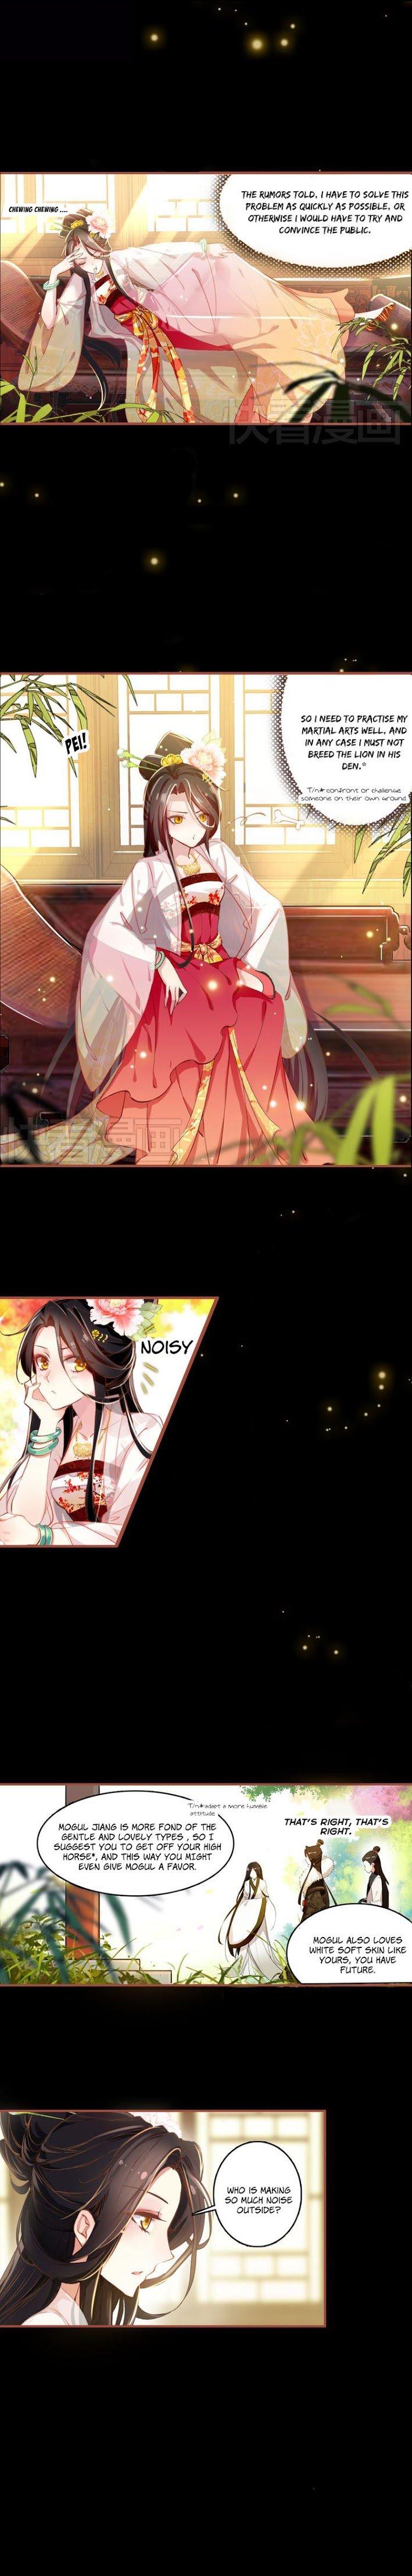 Manga She is a Beauty - Chapter 3 Page 1